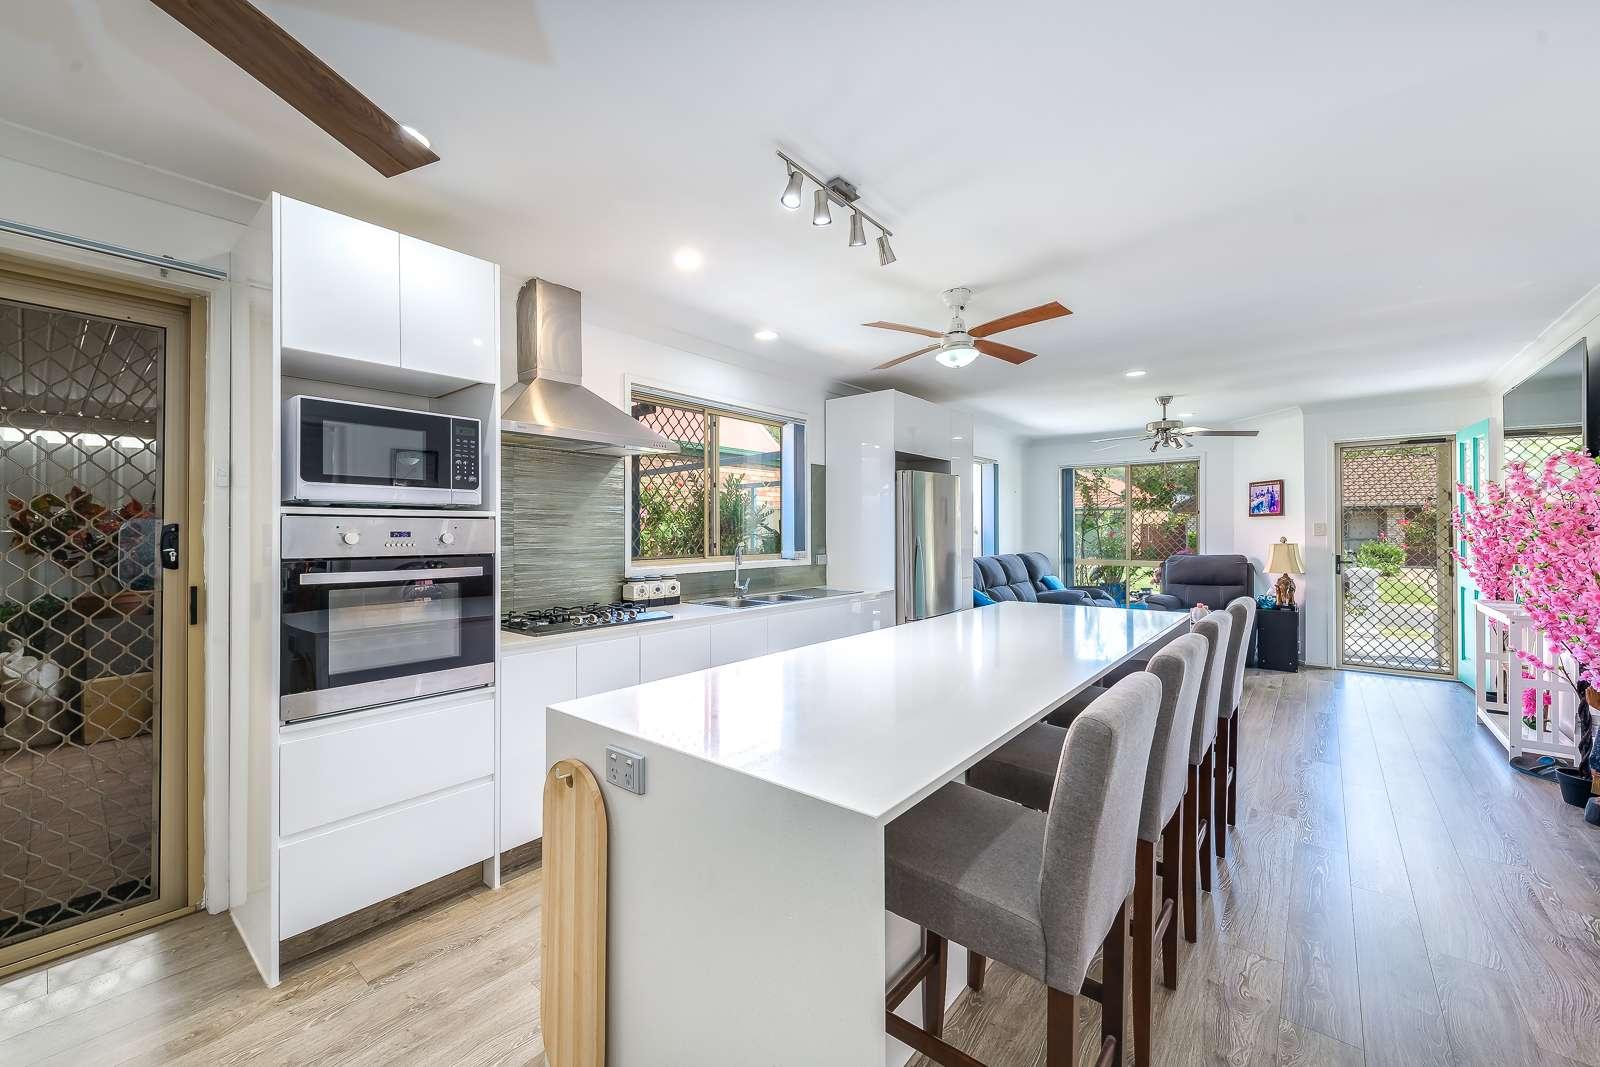 15 Renoir Drive, Coombabah, QLD 4216